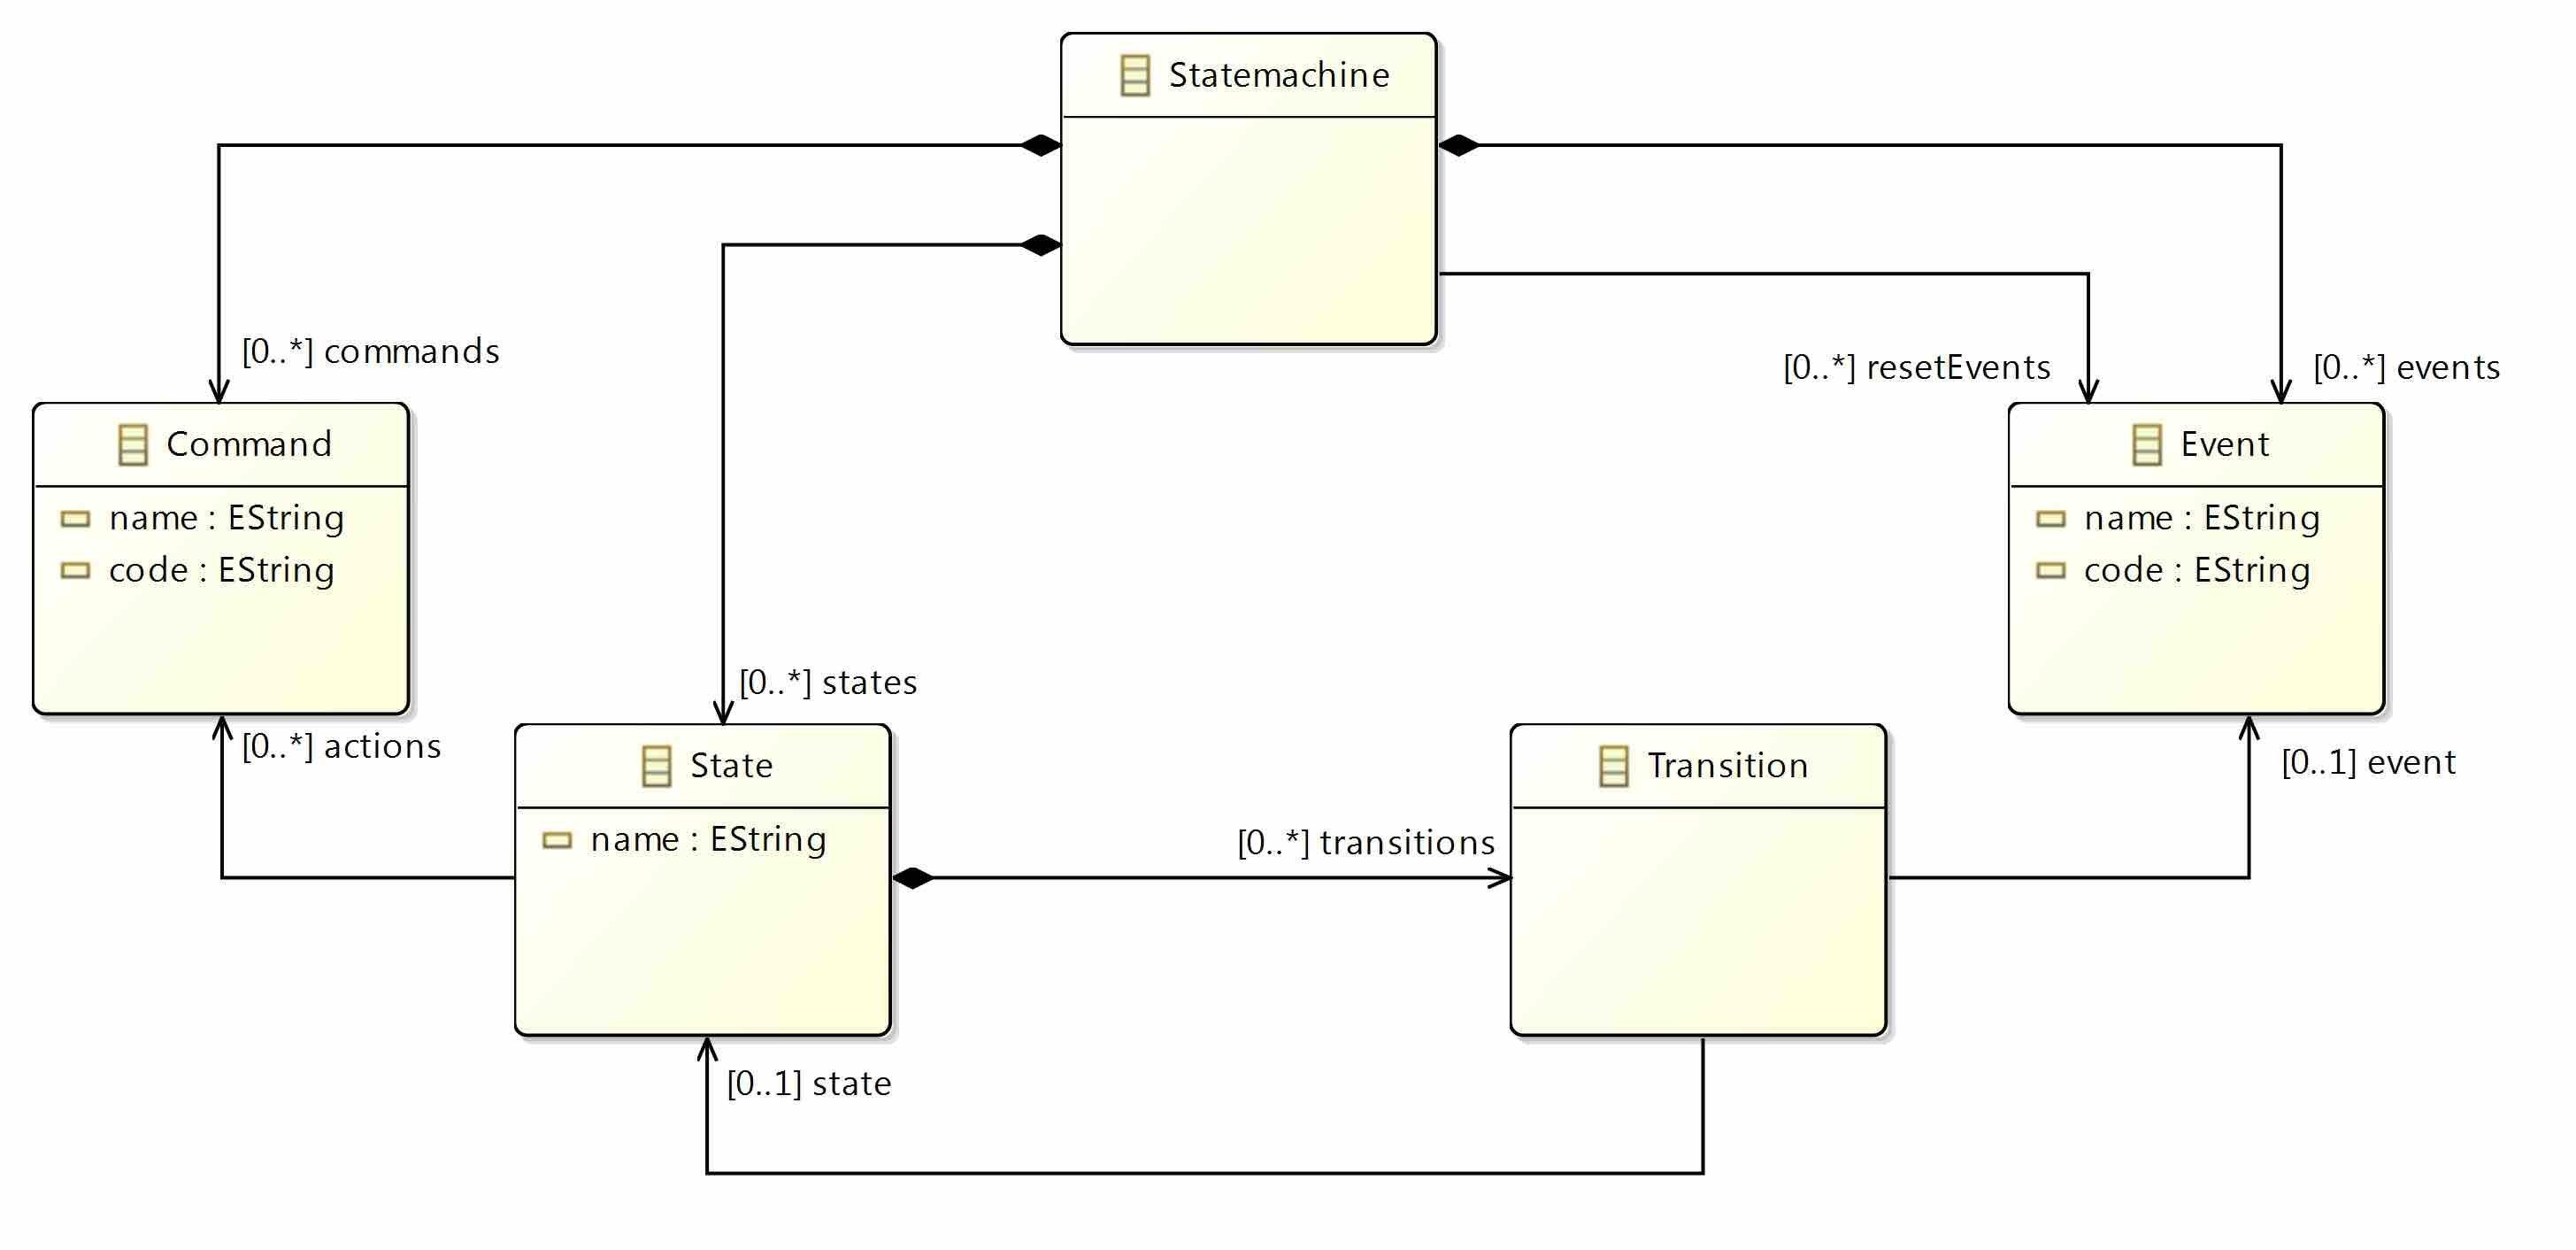 7_StateMachineExample_class_diagram